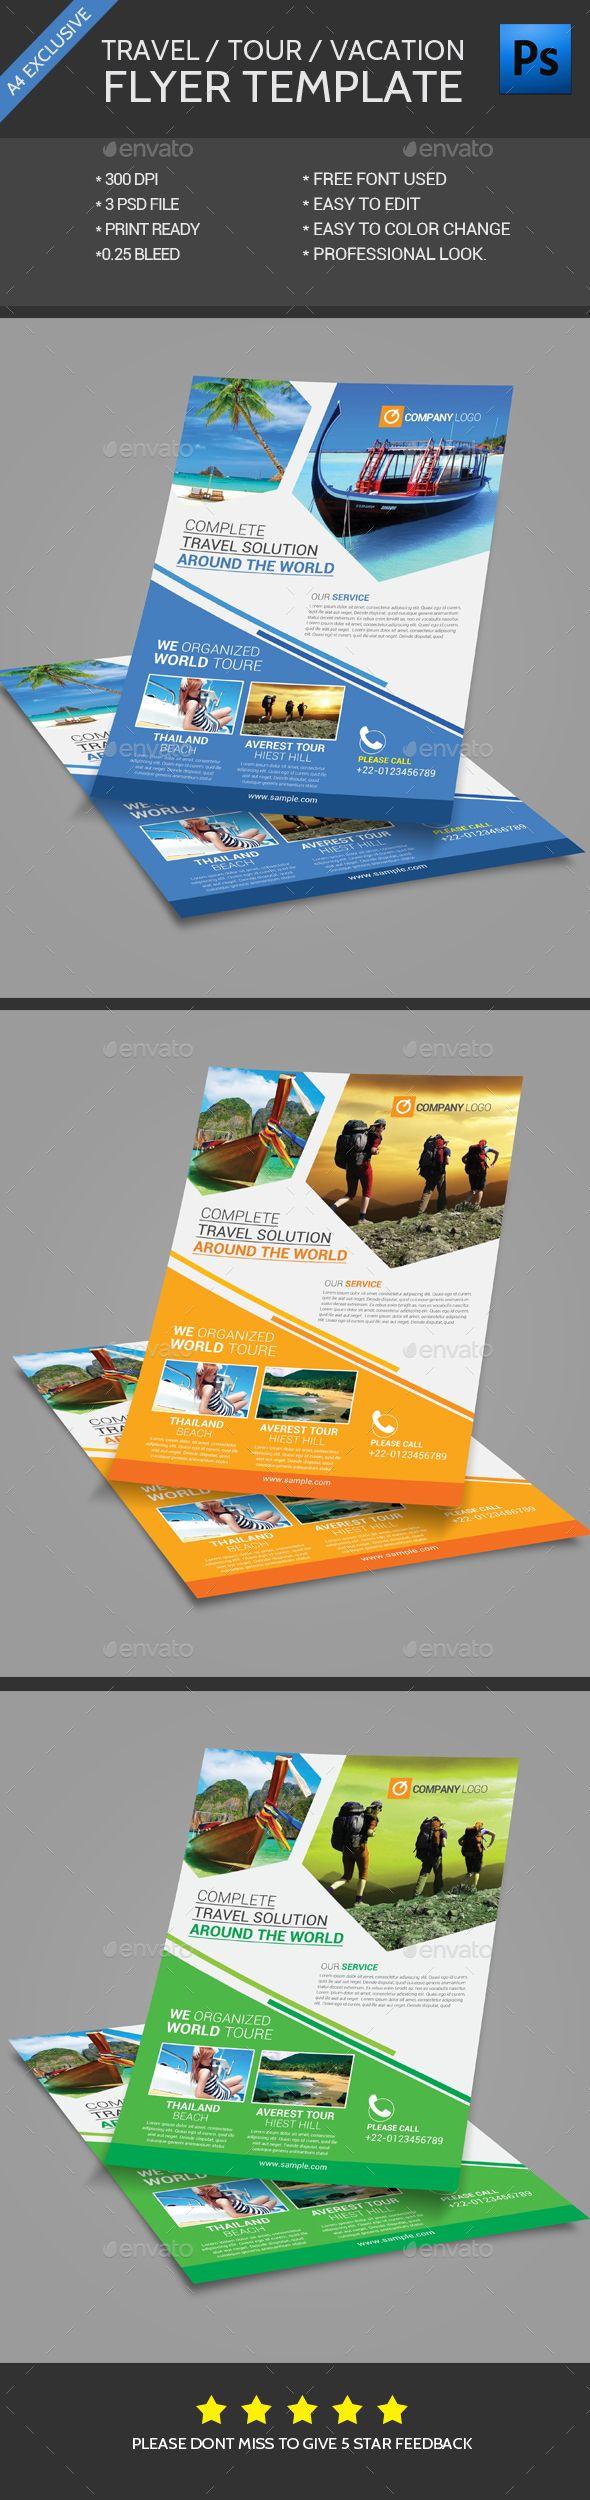 Travel Flyer Template - Flyers Print Templates